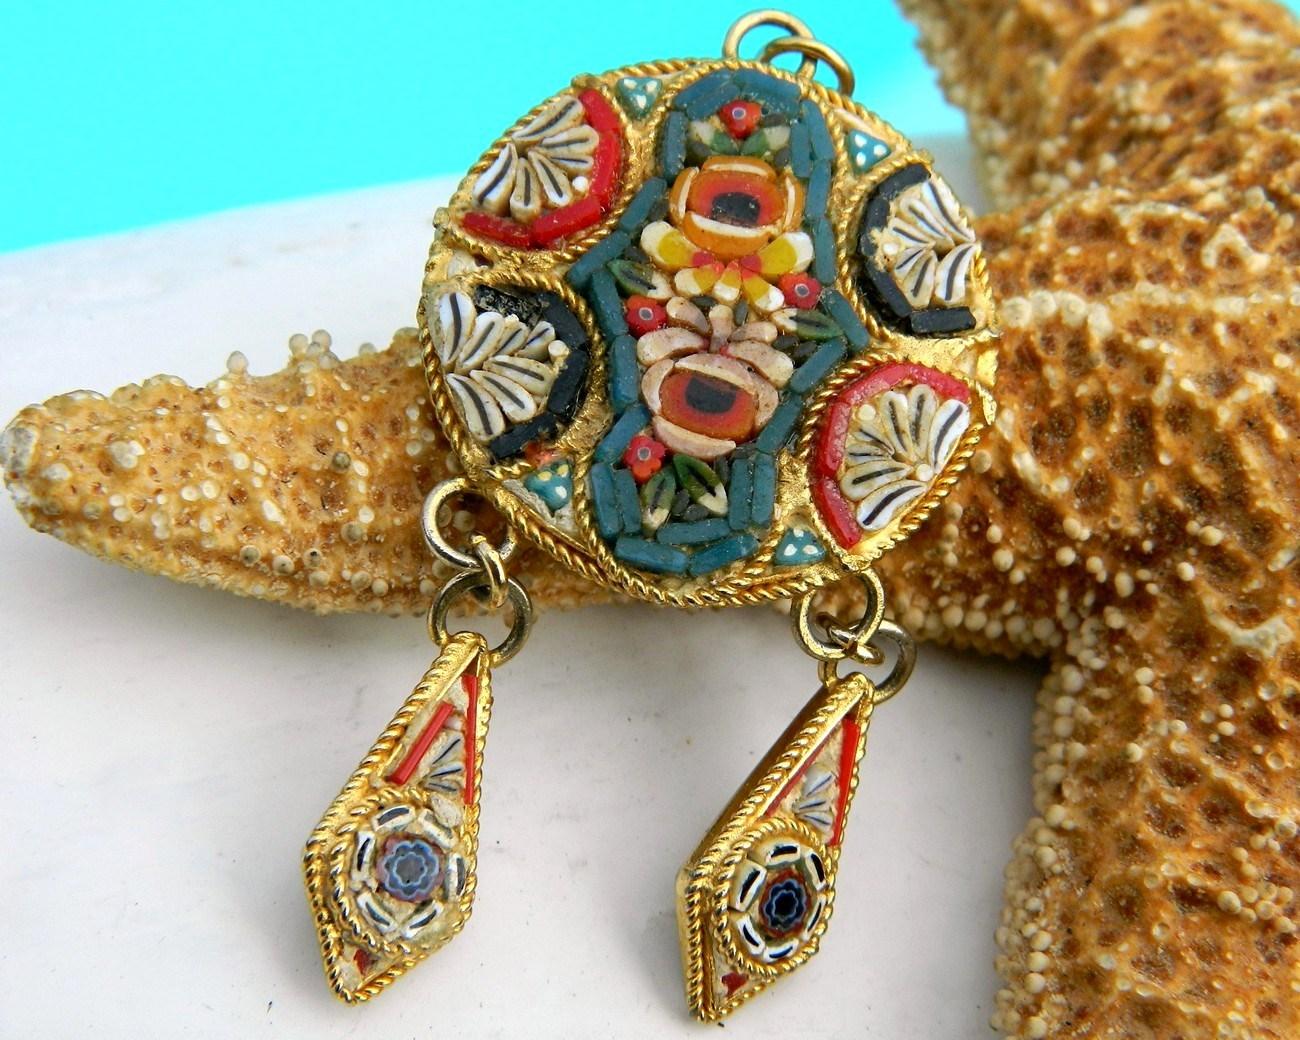 Vintage Micro Mosaic Italy Italian Pendant Dangles Flowers Tesserae